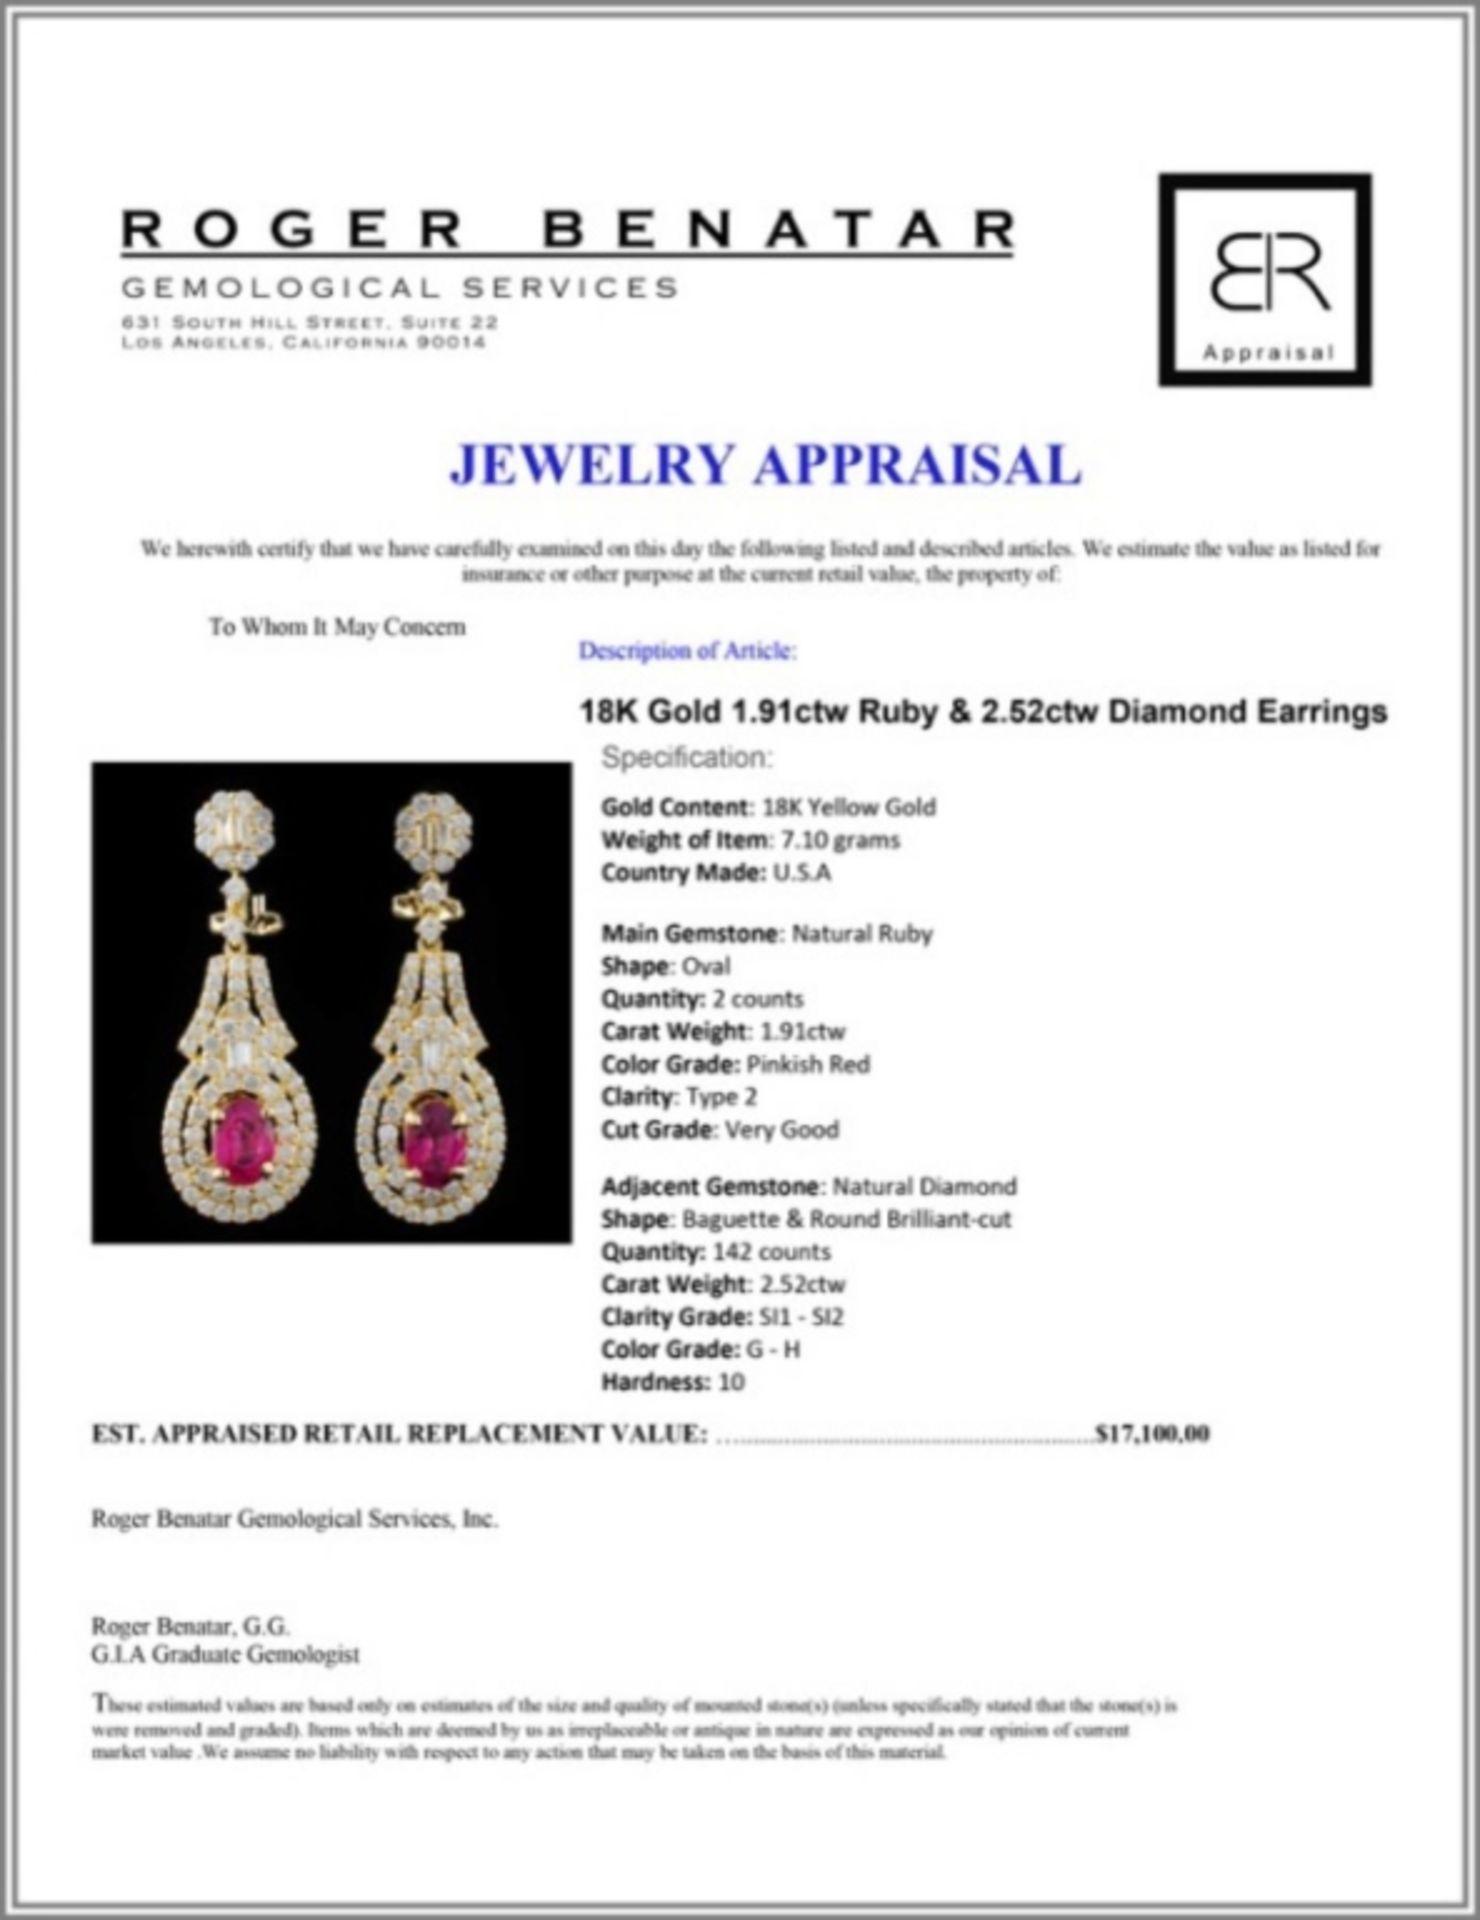 18K Gold 1.91ctw Ruby & 2.52ctw Diamond Earrings - Image 3 of 3